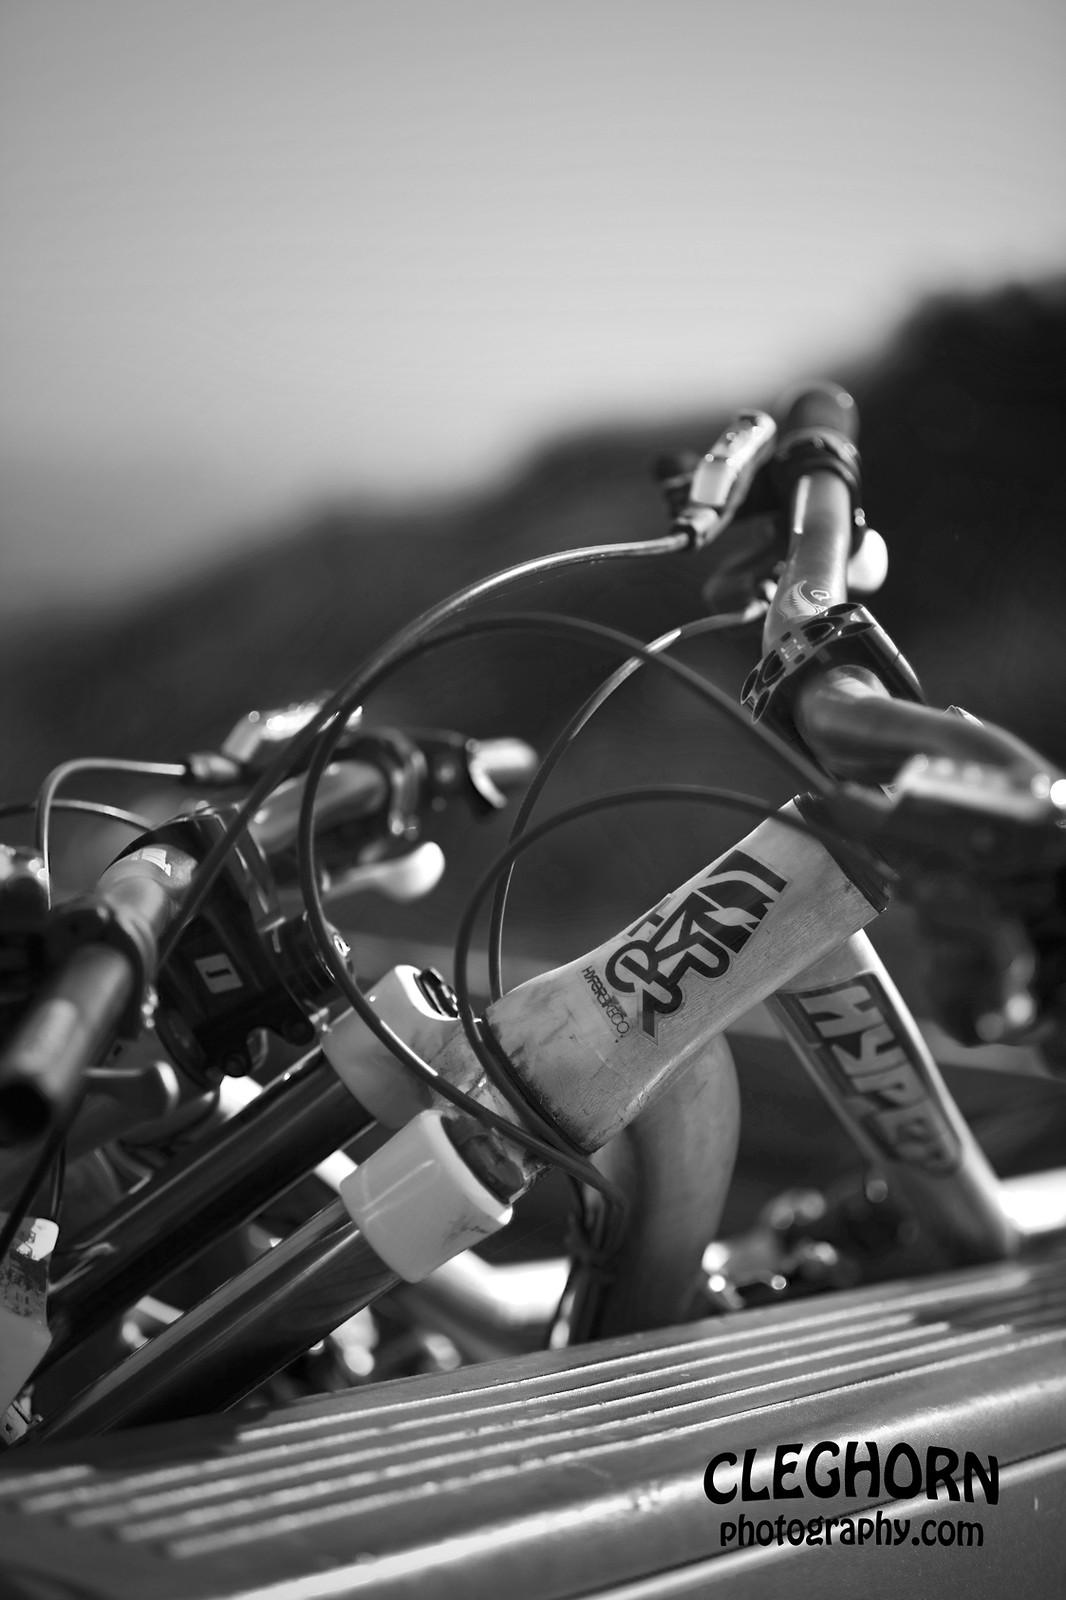 Hyper MTB - Cleghorn Photography - Mountain Biking Pictures - Vital MTB